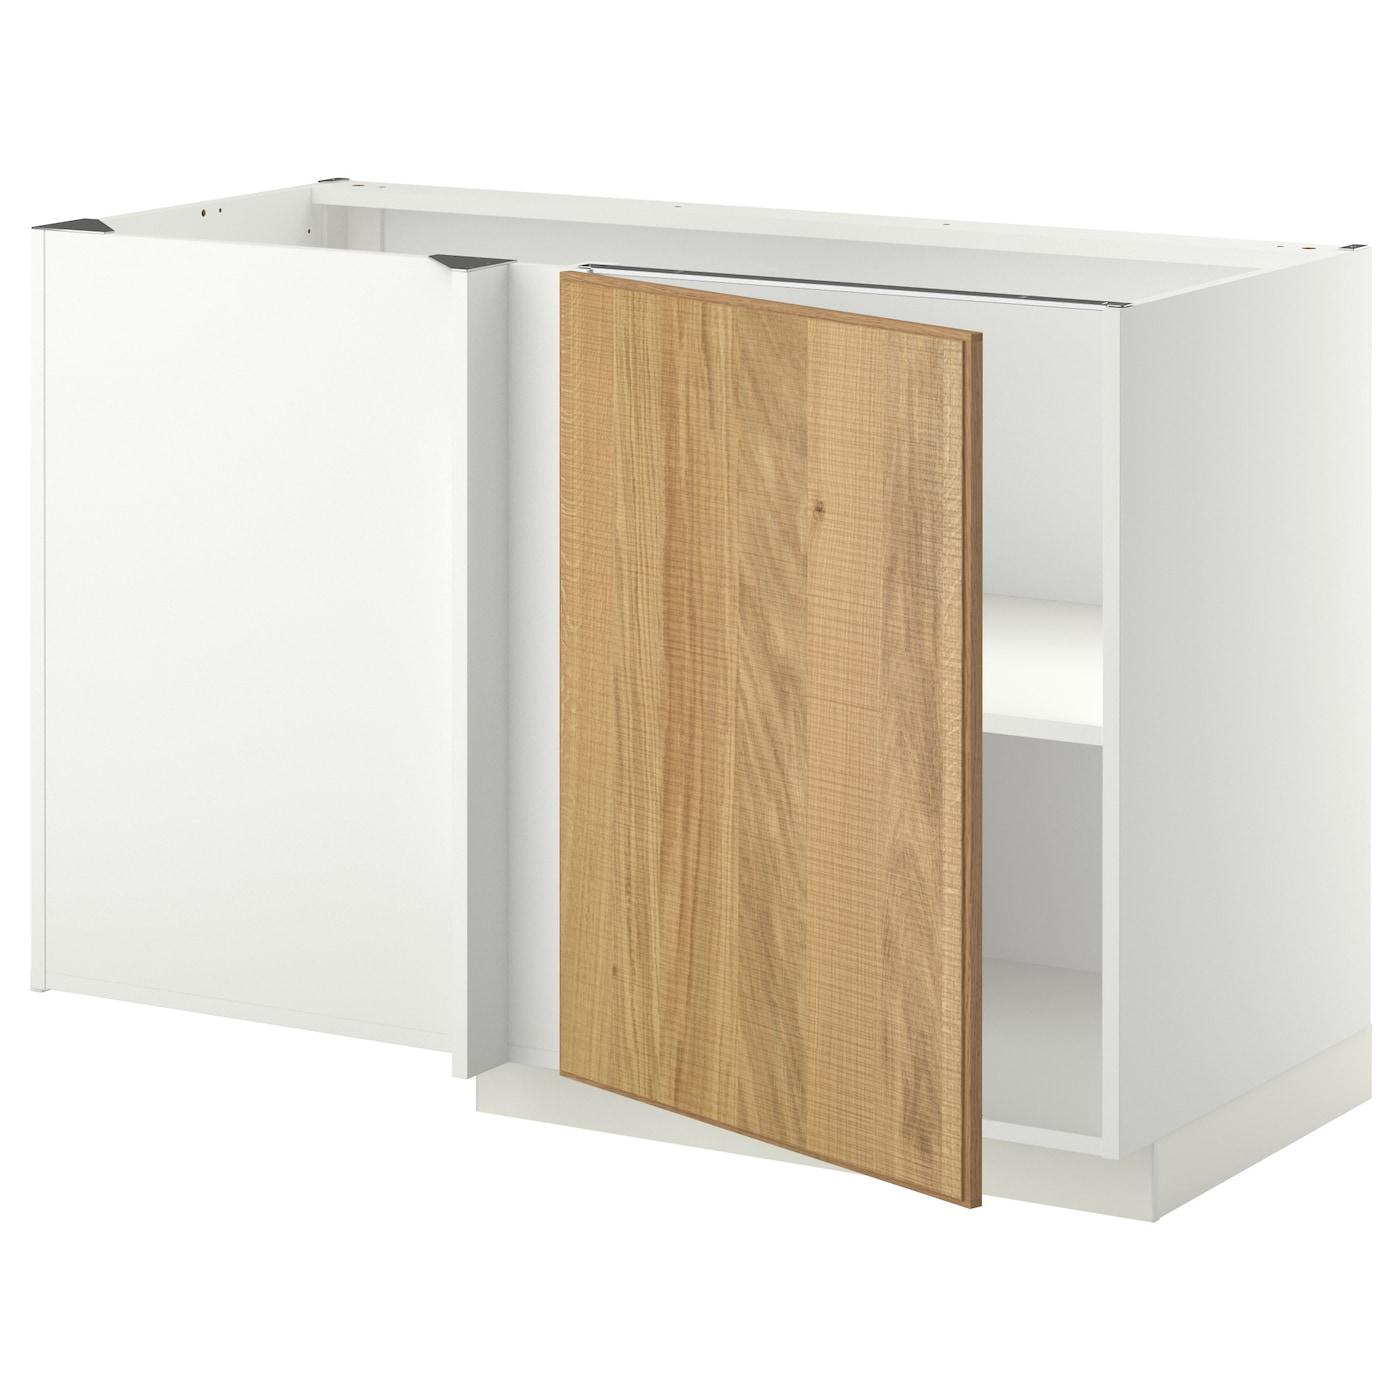 Beautiful Base Cucina Ikea Images - Home Ideas - tyger.us